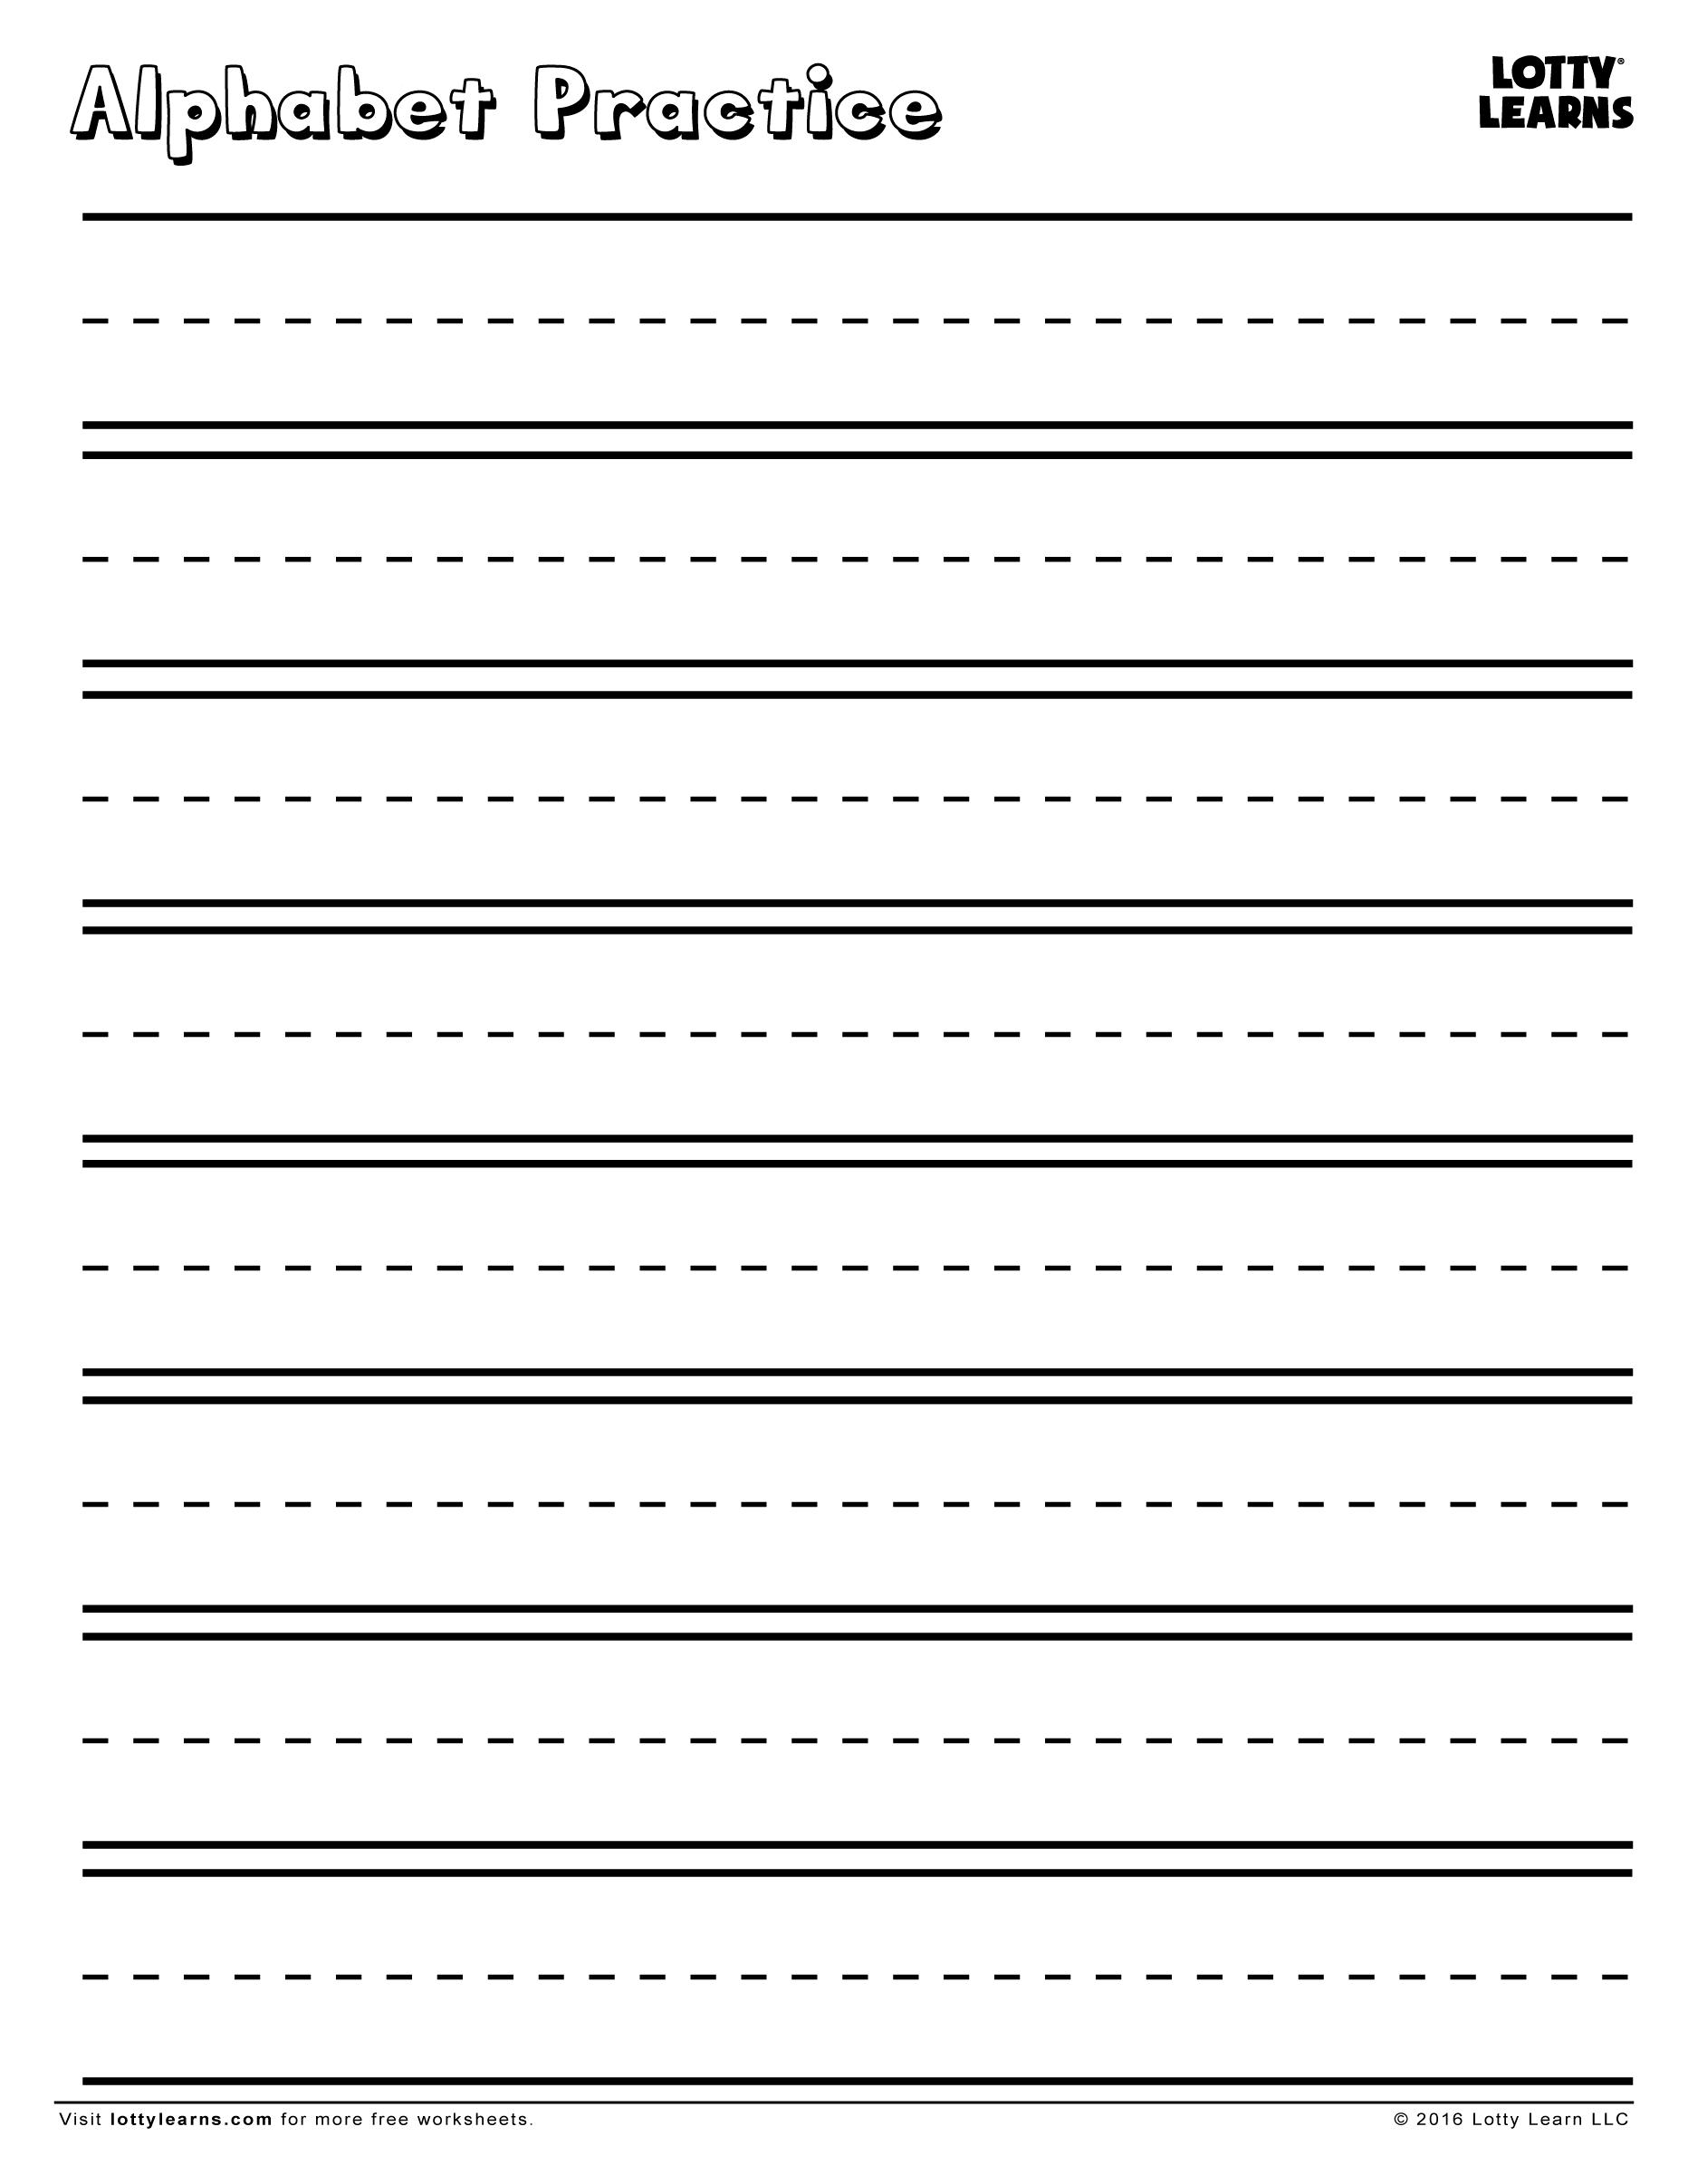 Alphabet Practice Sheet